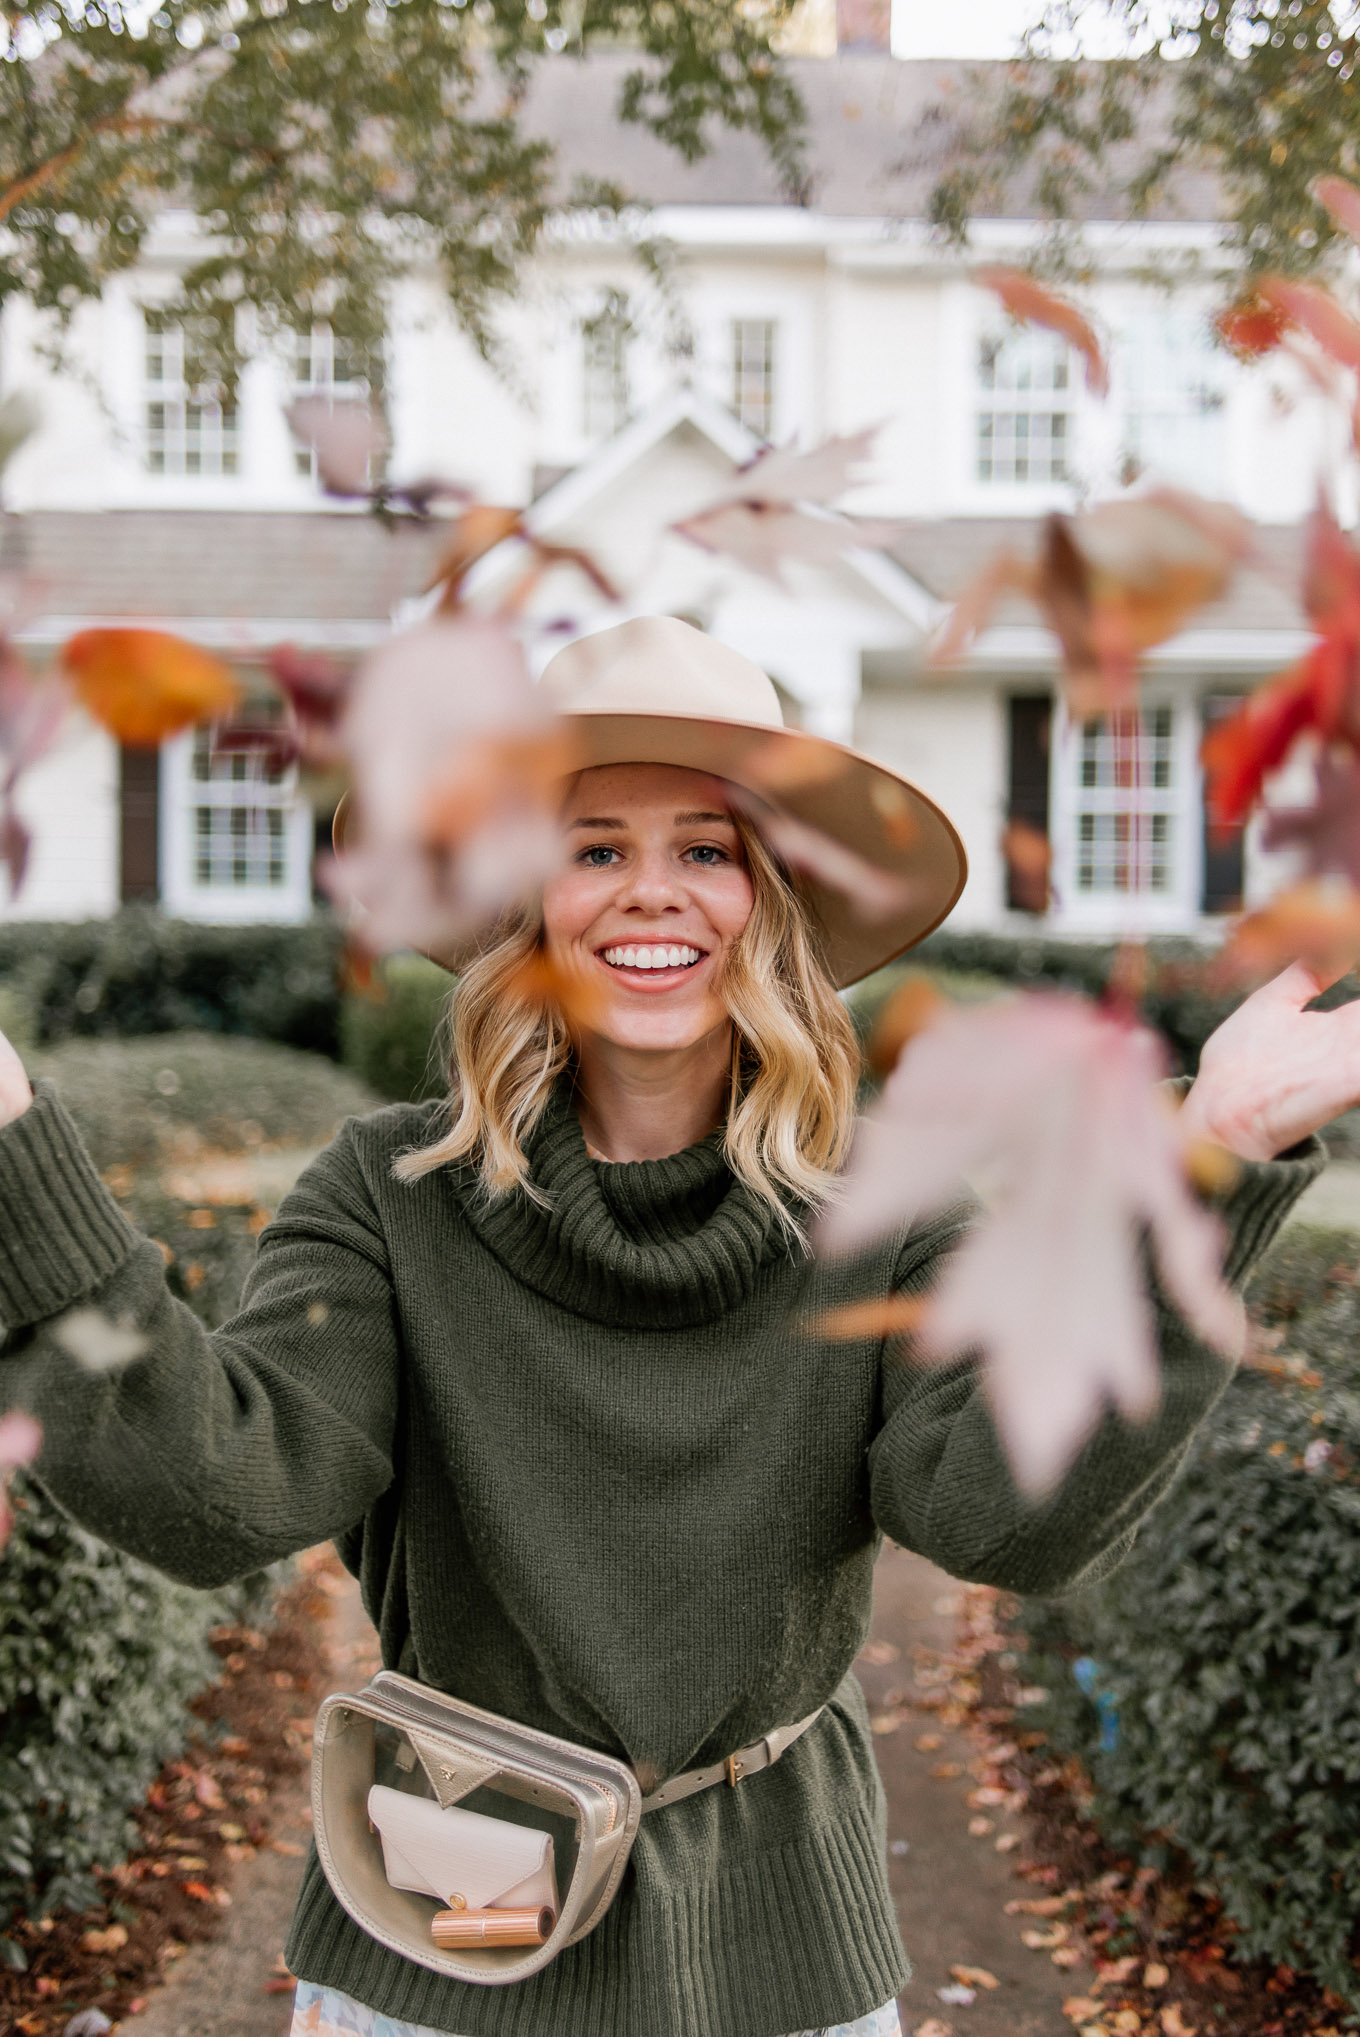 Ultimate Fall Look | Turtleneck Sweater, Plaid Midi Dress, Lack of Color Wool Hat, Metallic Clear Belt Bag | Louella Reese